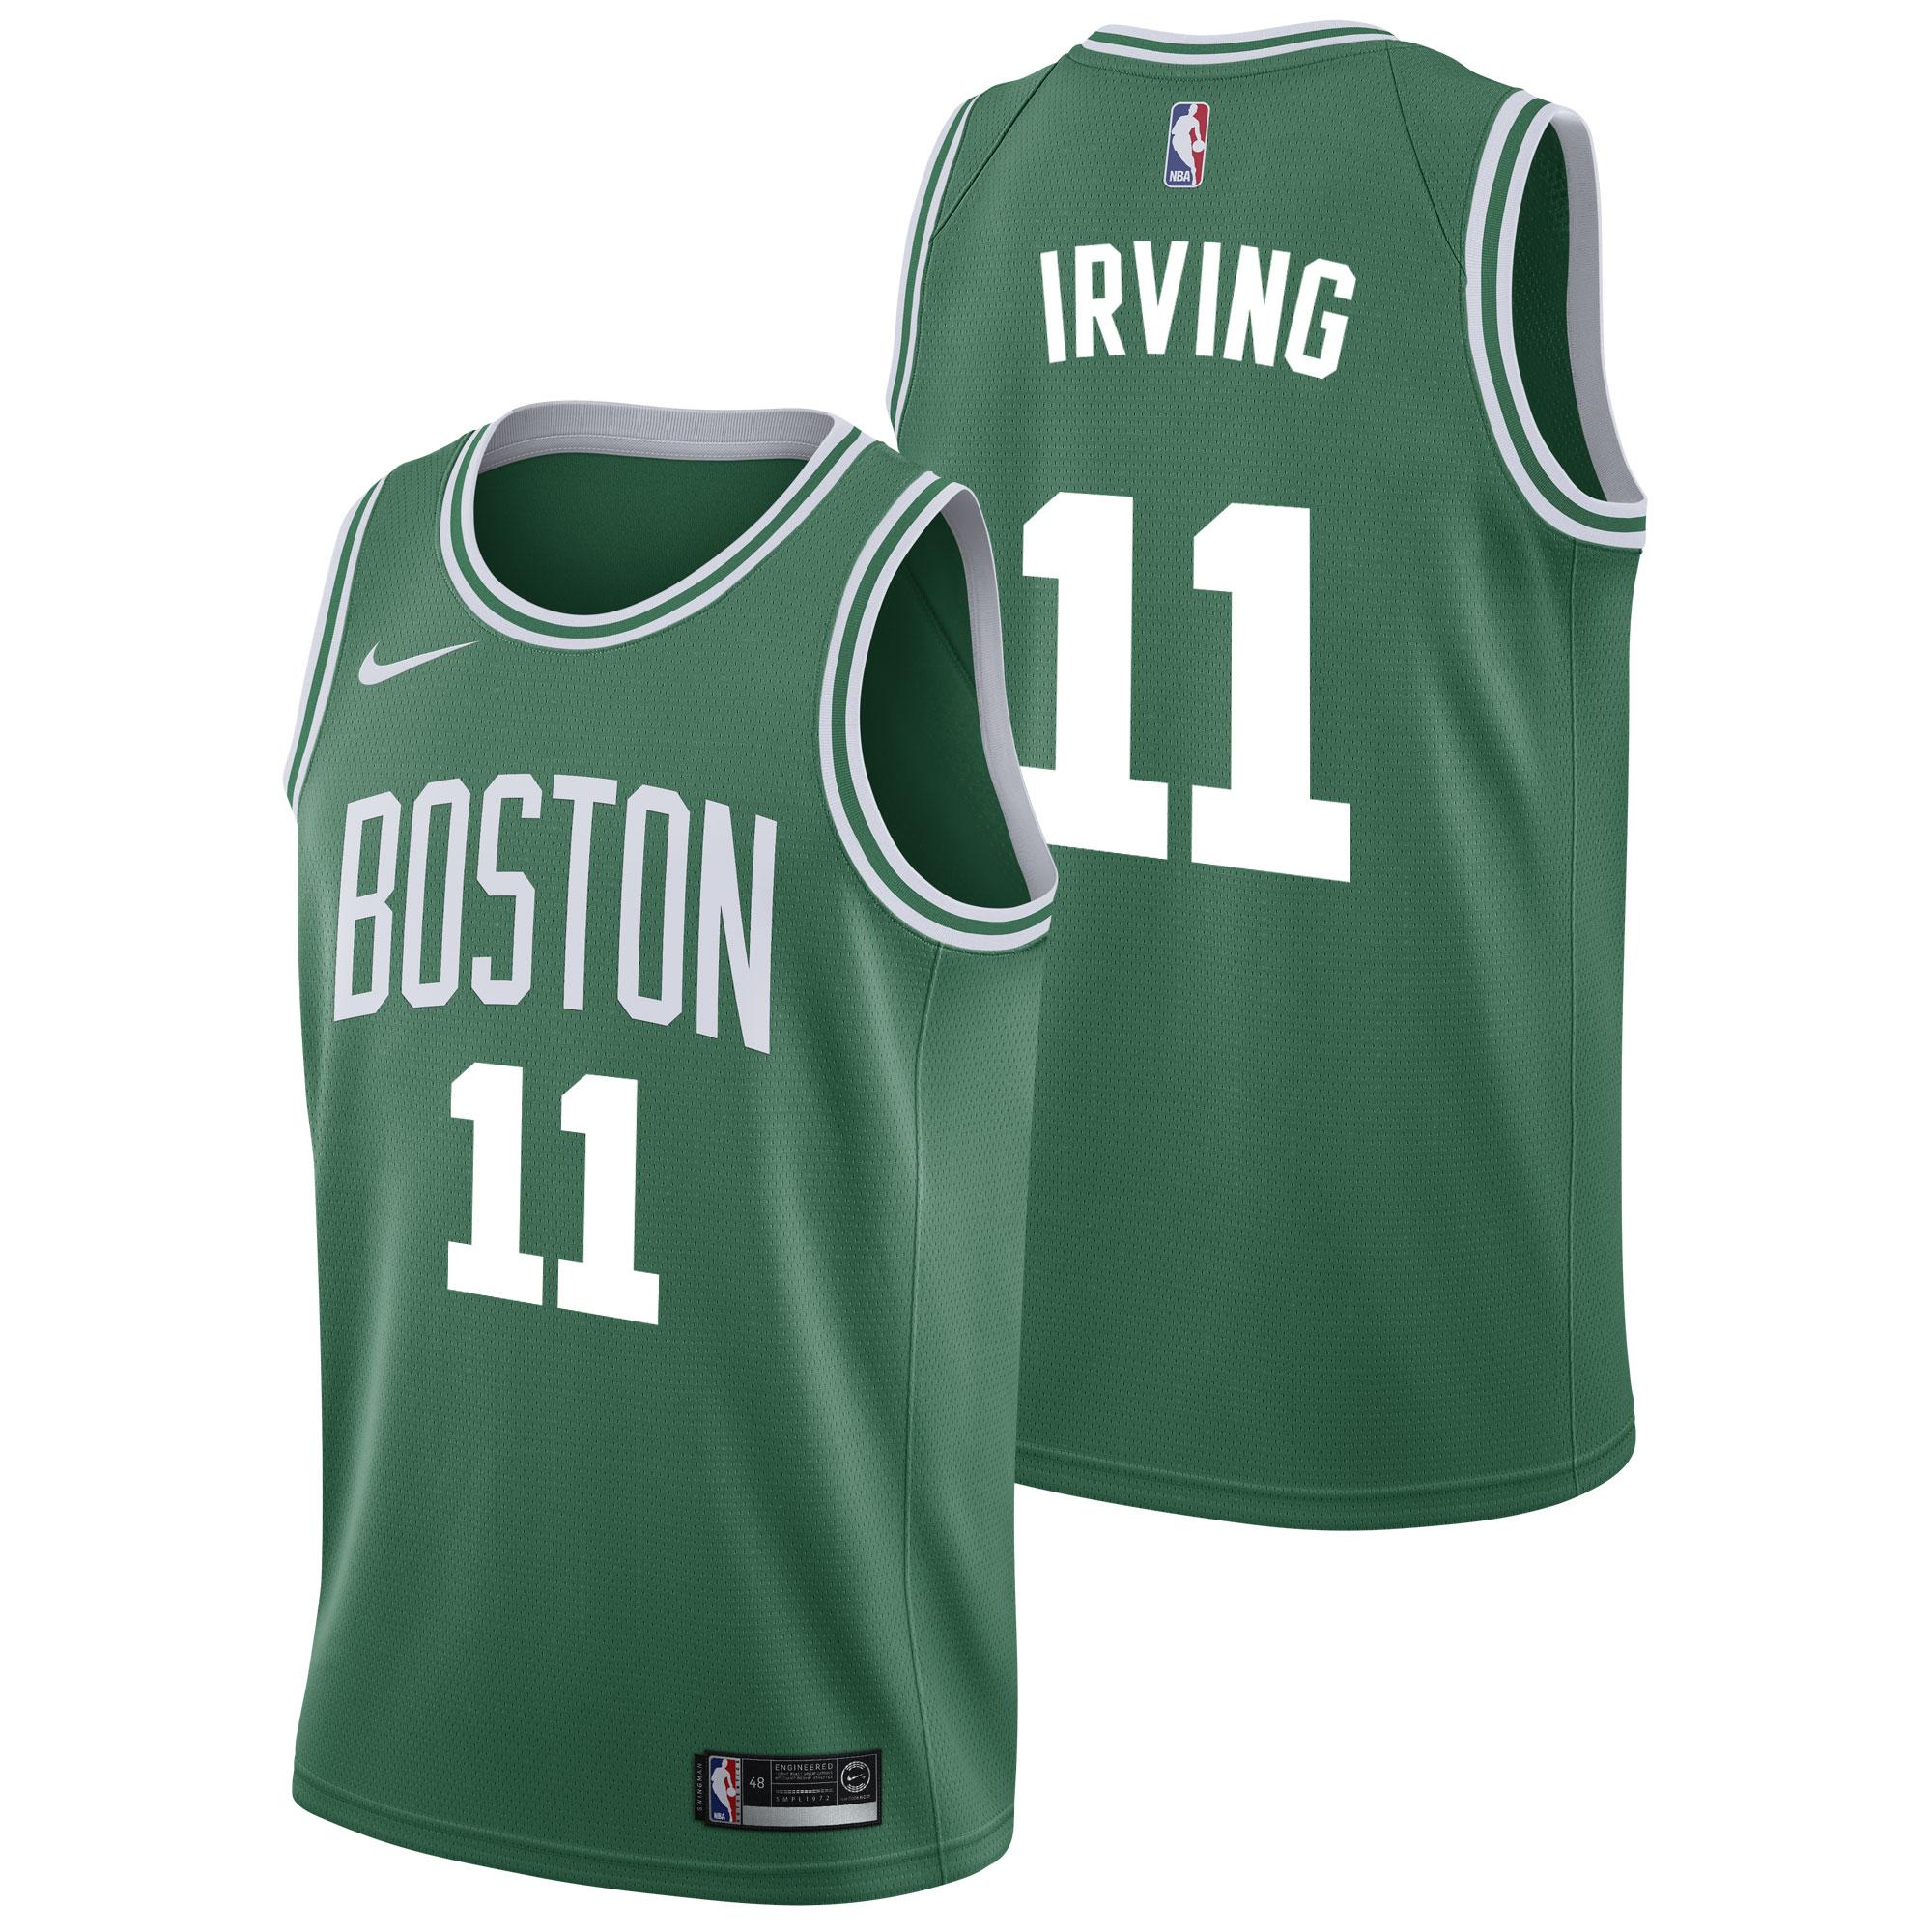 """Boston Celtics Nike Icon Swingman Jersey - Kyrie Irving - Mens"""